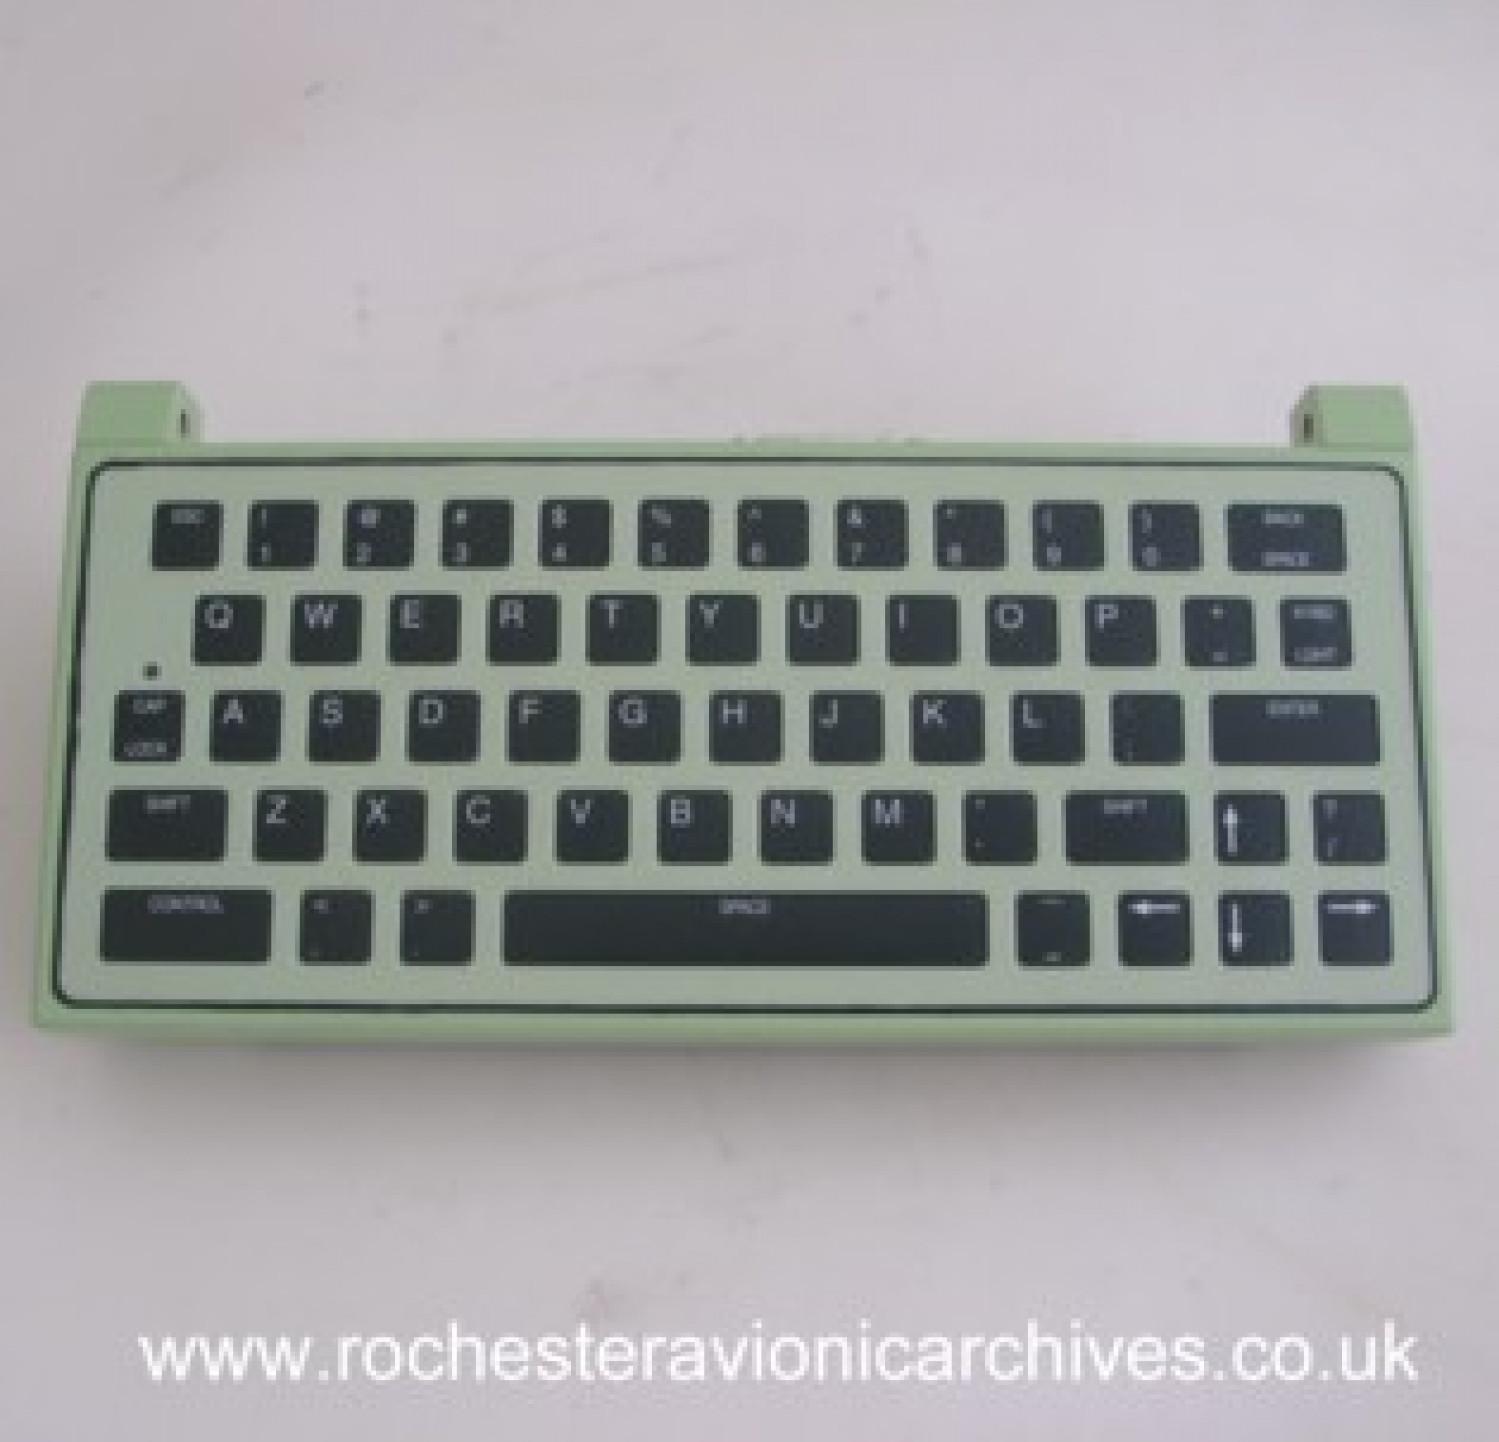 Tank Commander's QWERTY Keyboard